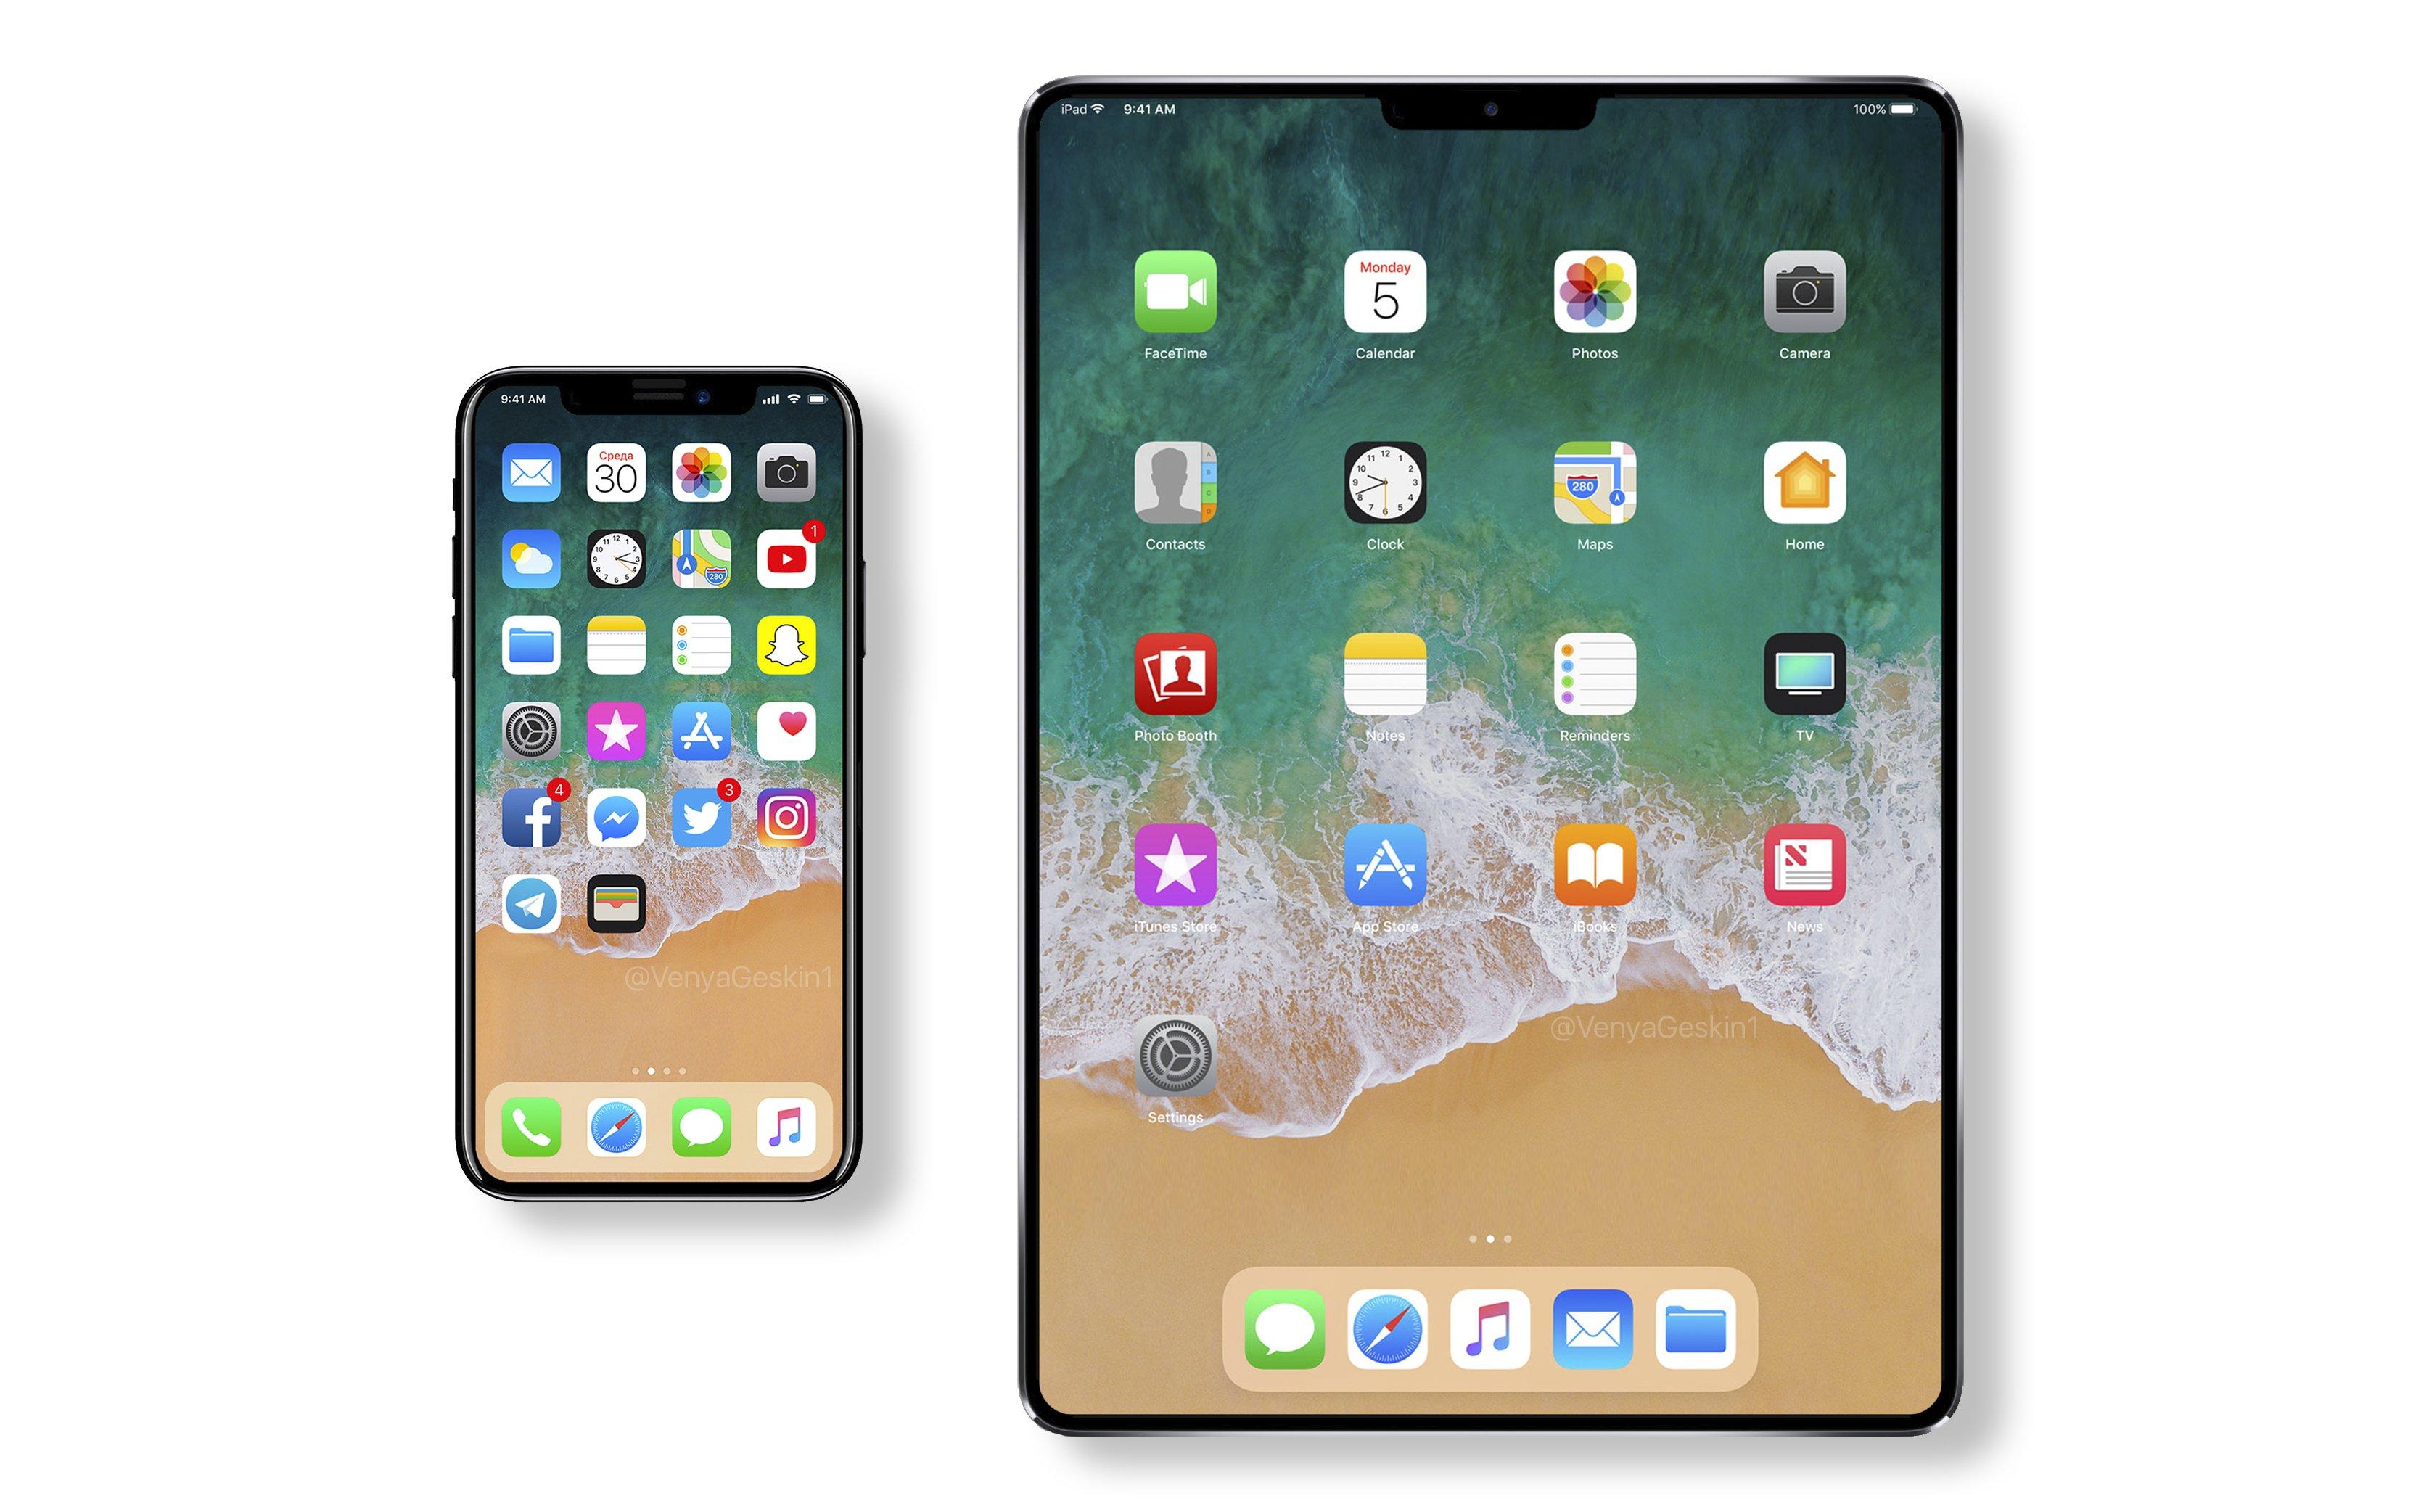 apple ipad x face id et cran sans bords d s 2018. Black Bedroom Furniture Sets. Home Design Ideas